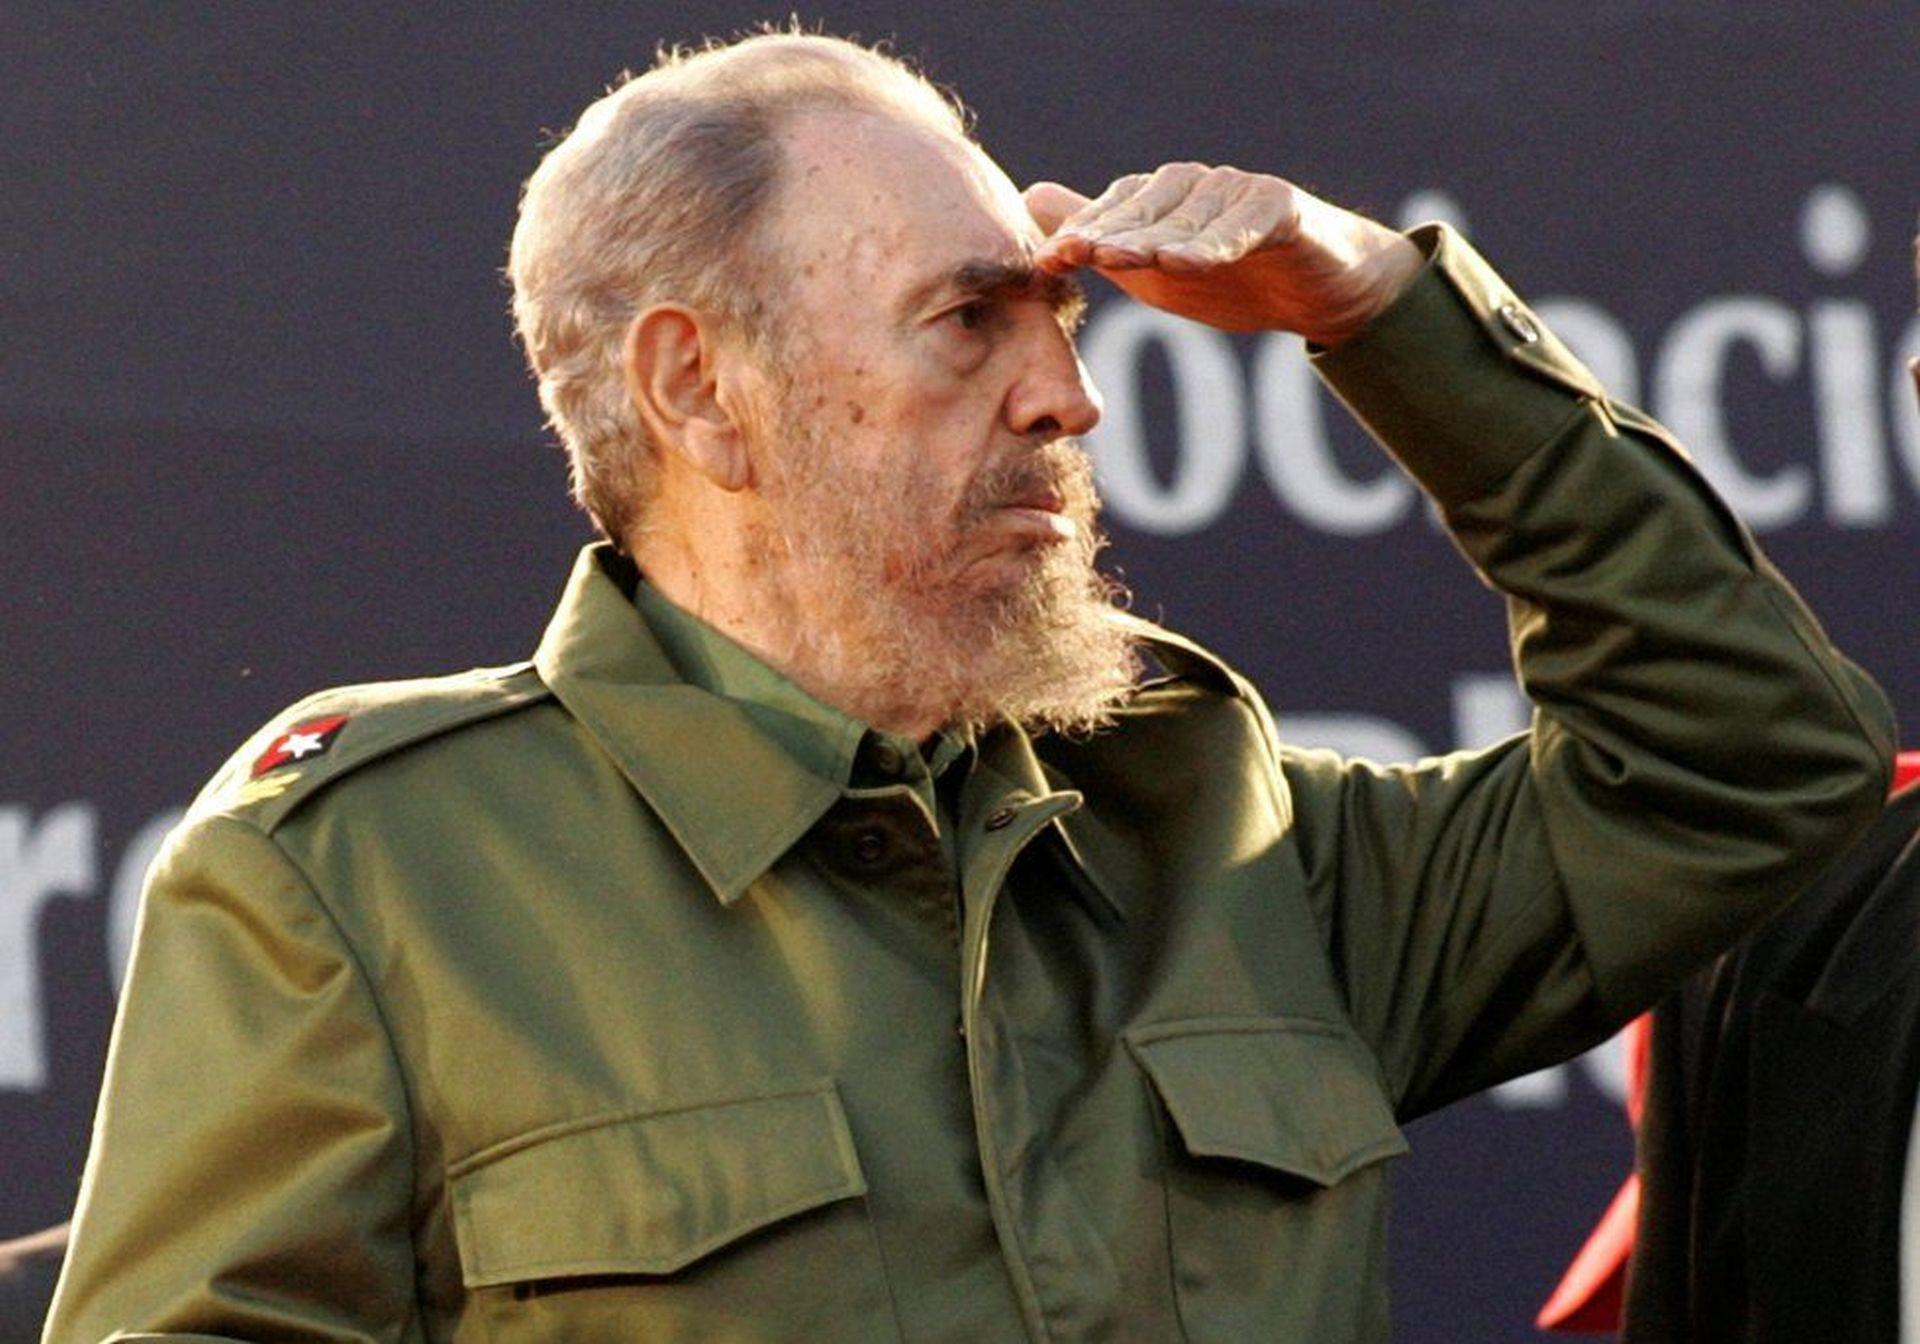 escambray today, fidel castro, cuban revolution leader fidel castro, cuban revolution